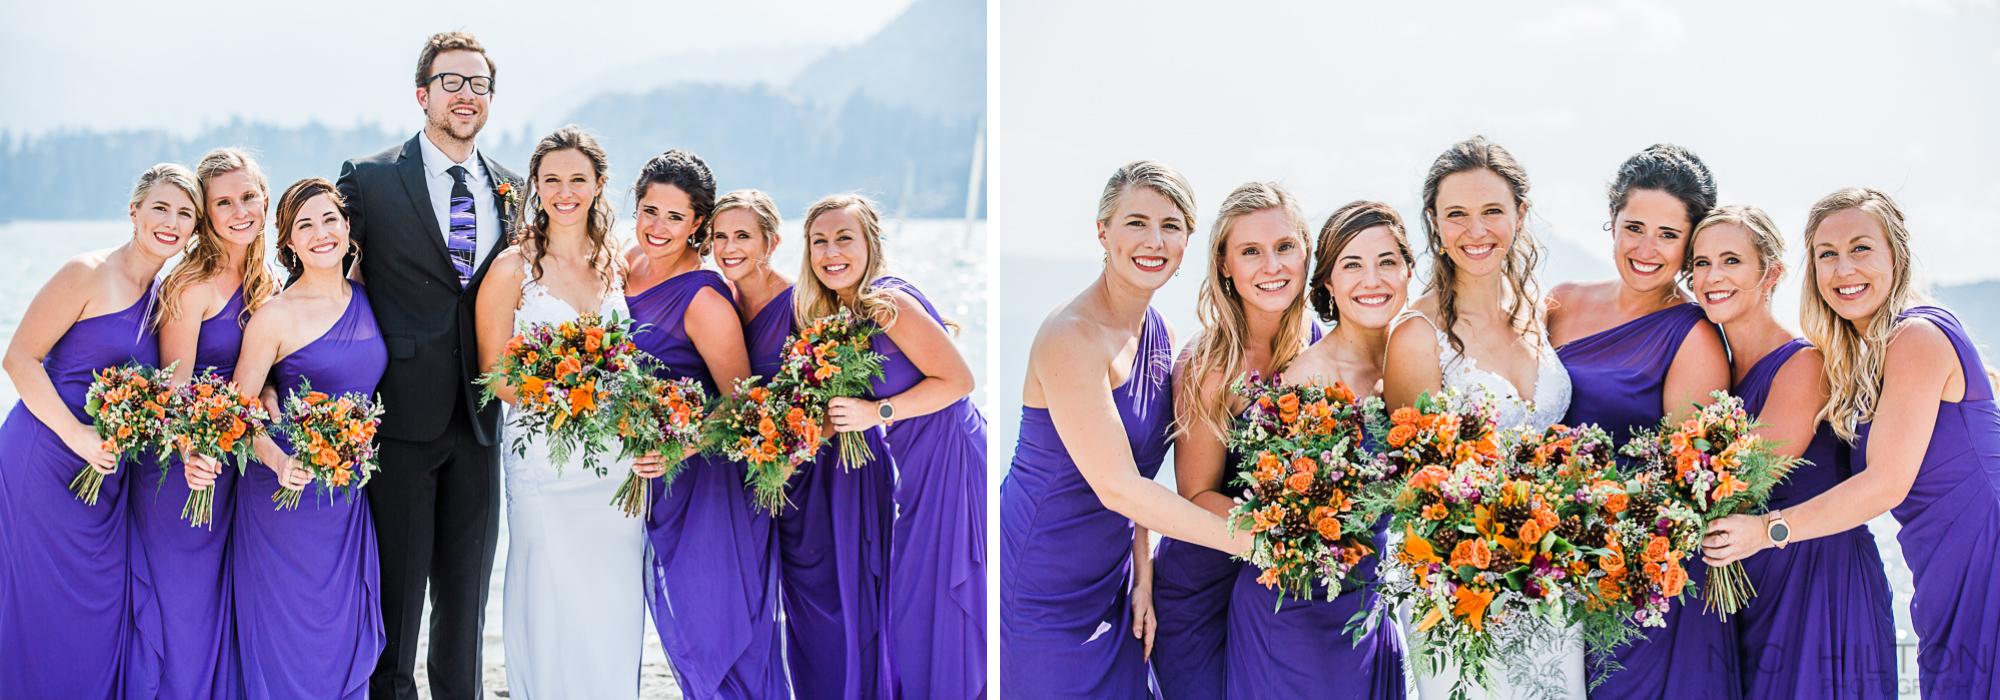 Bridal-party-june-lake-beach-wedding.jpg